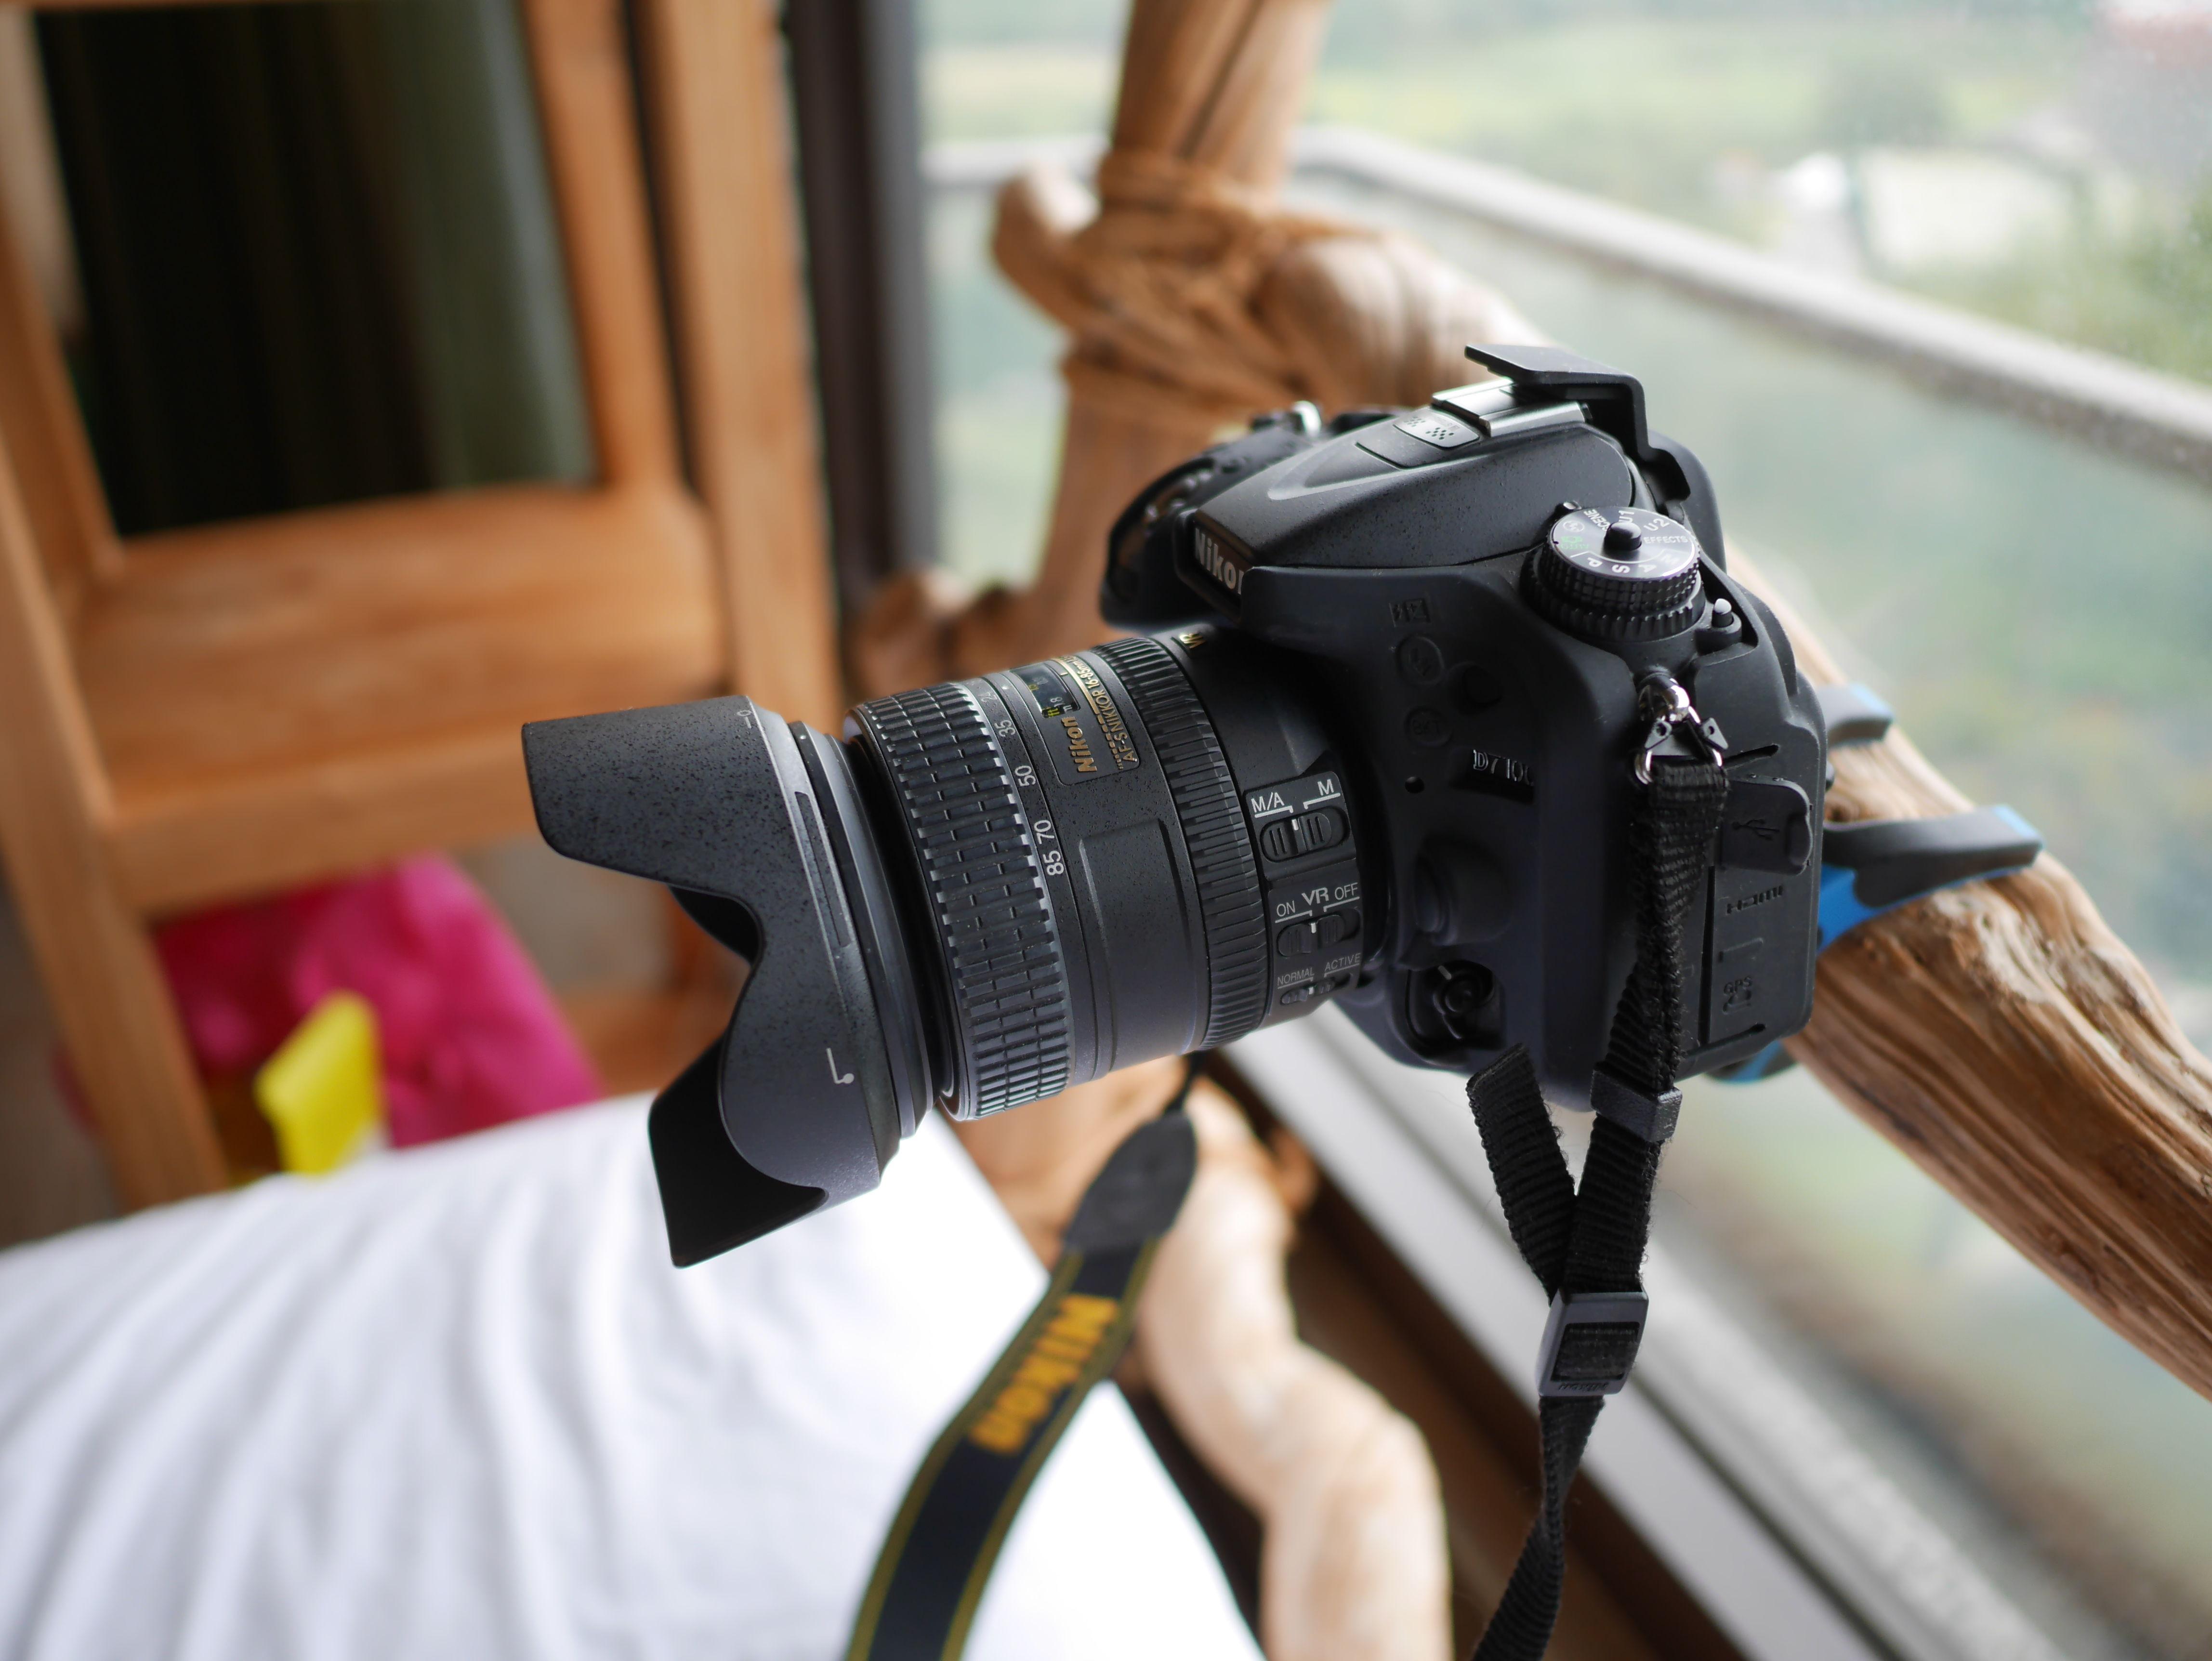 01 Mobile-Catch 行動釽  行動抓 行動爬 行動拔 行動杷 手機固定器 單眼固定器 相機固定器.JPG